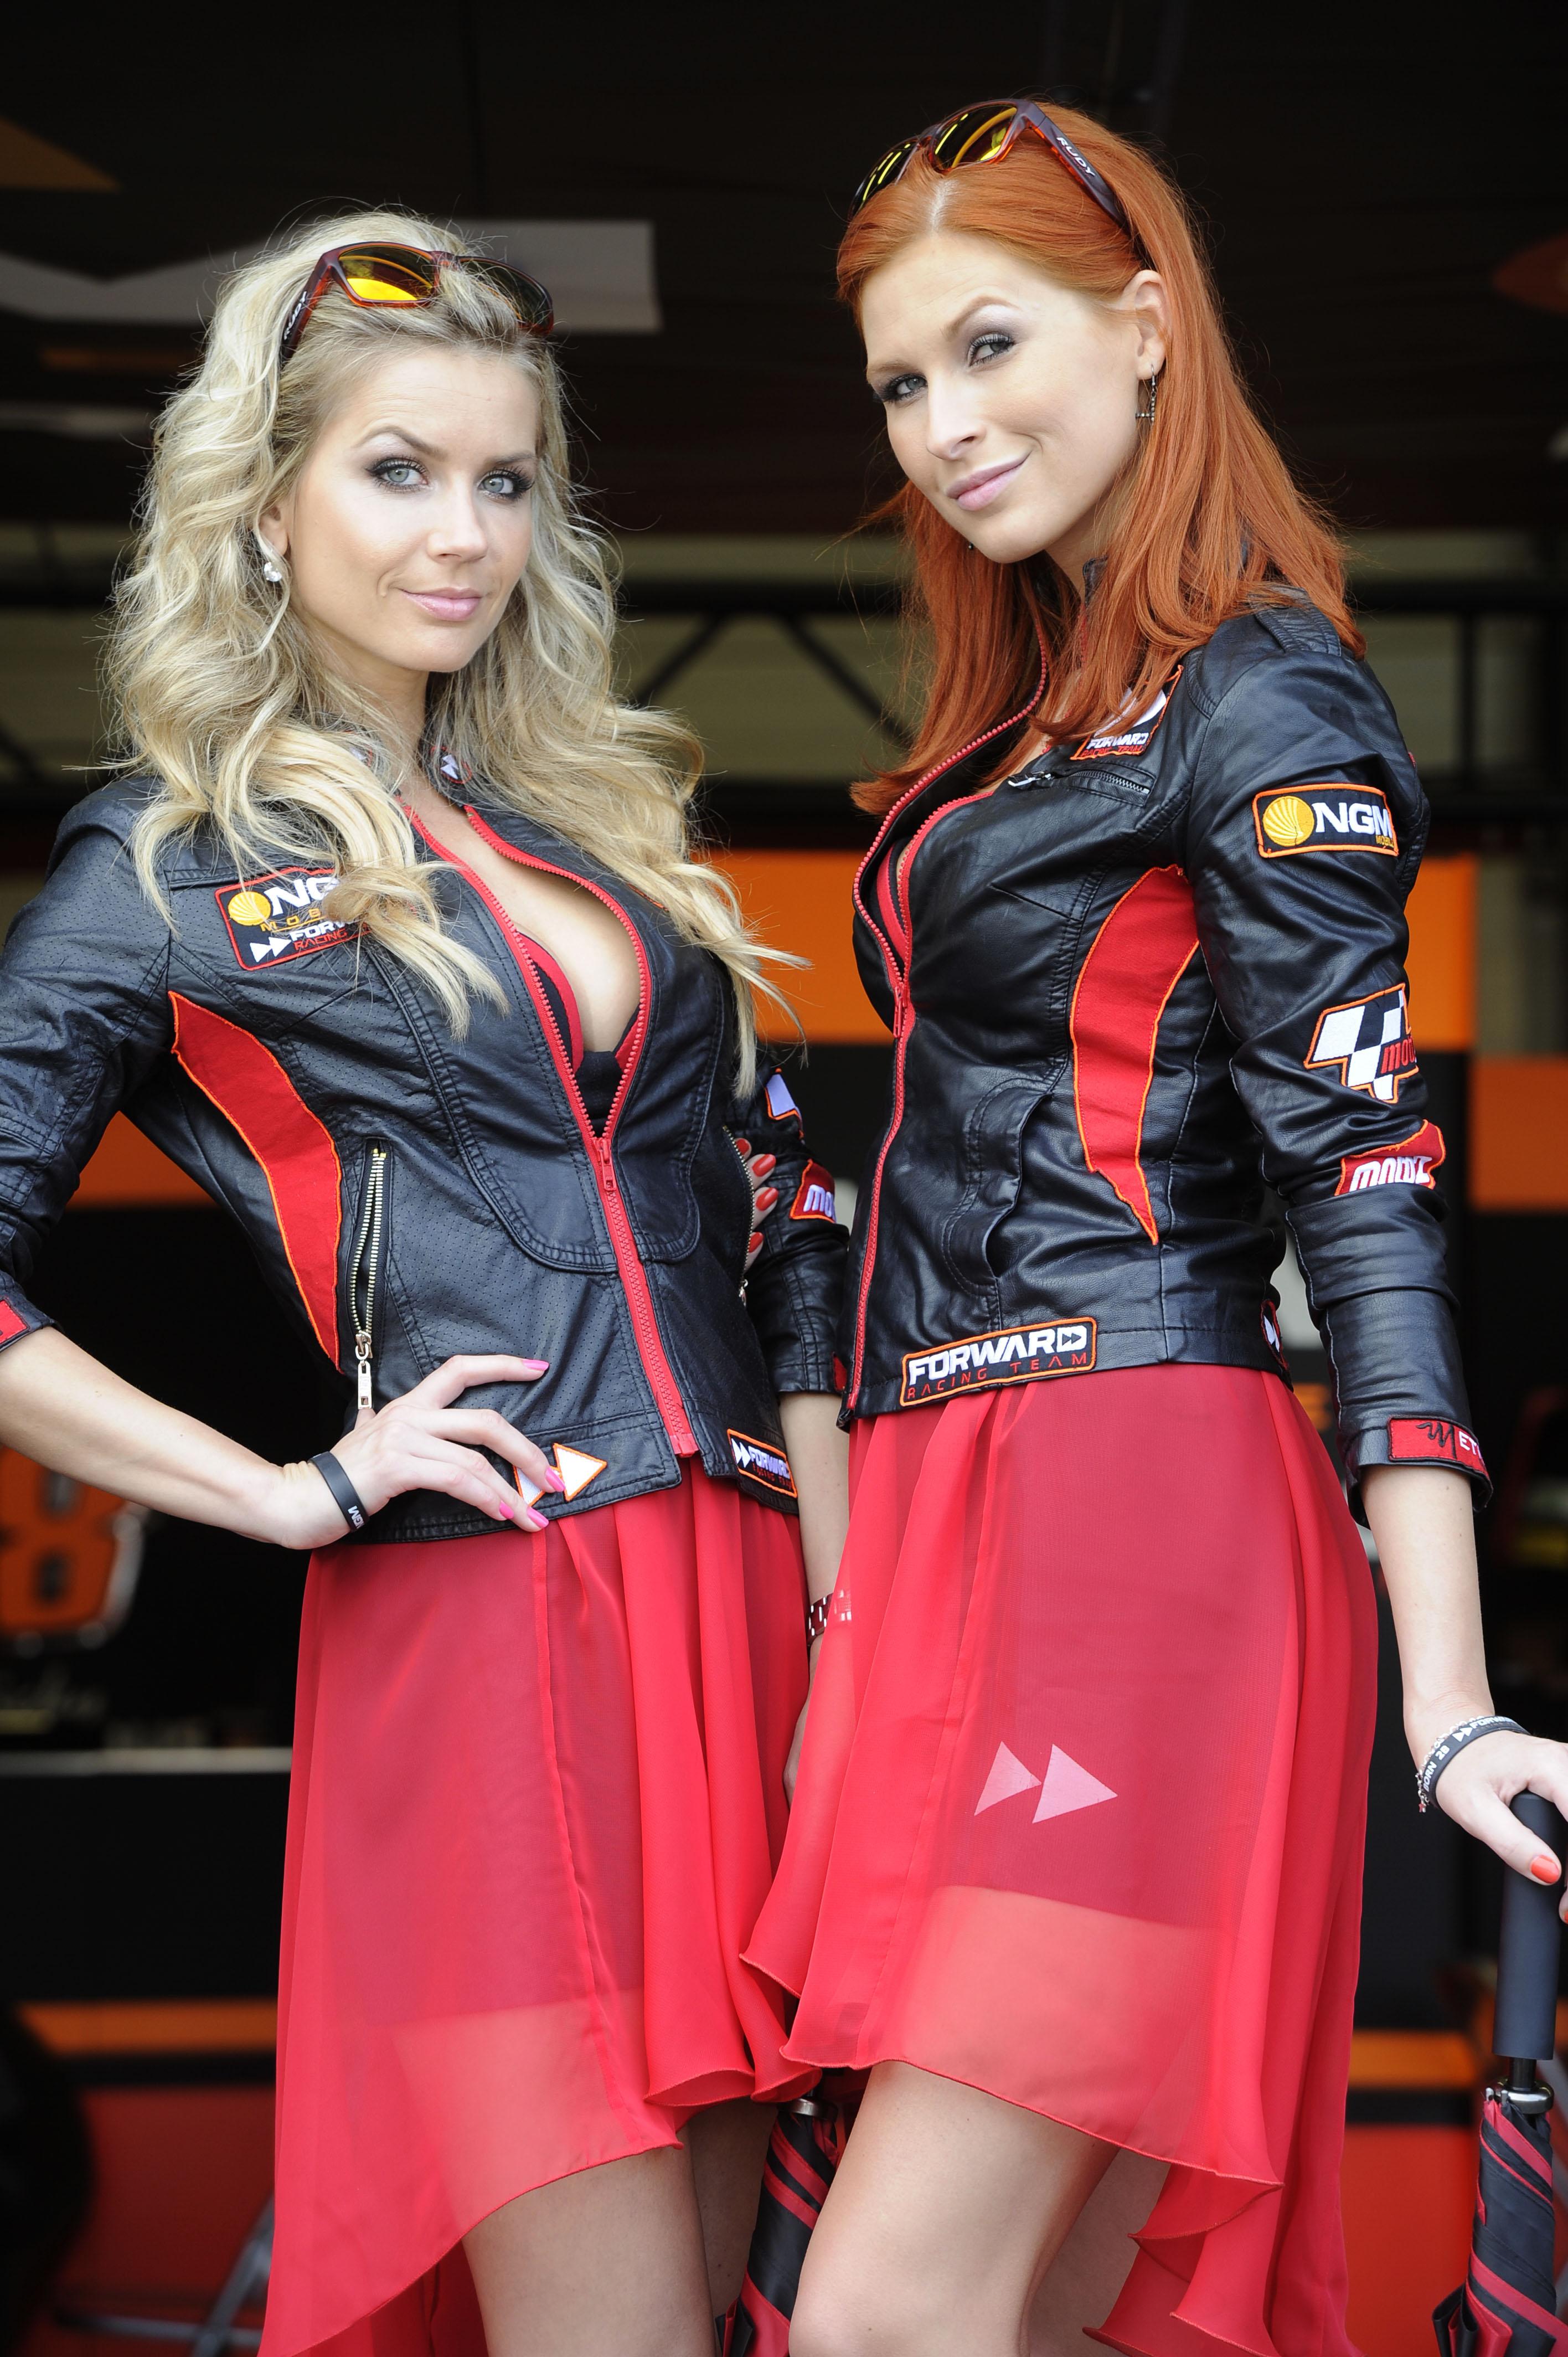 German MotoGP Grid Girls | MCNews.com.au